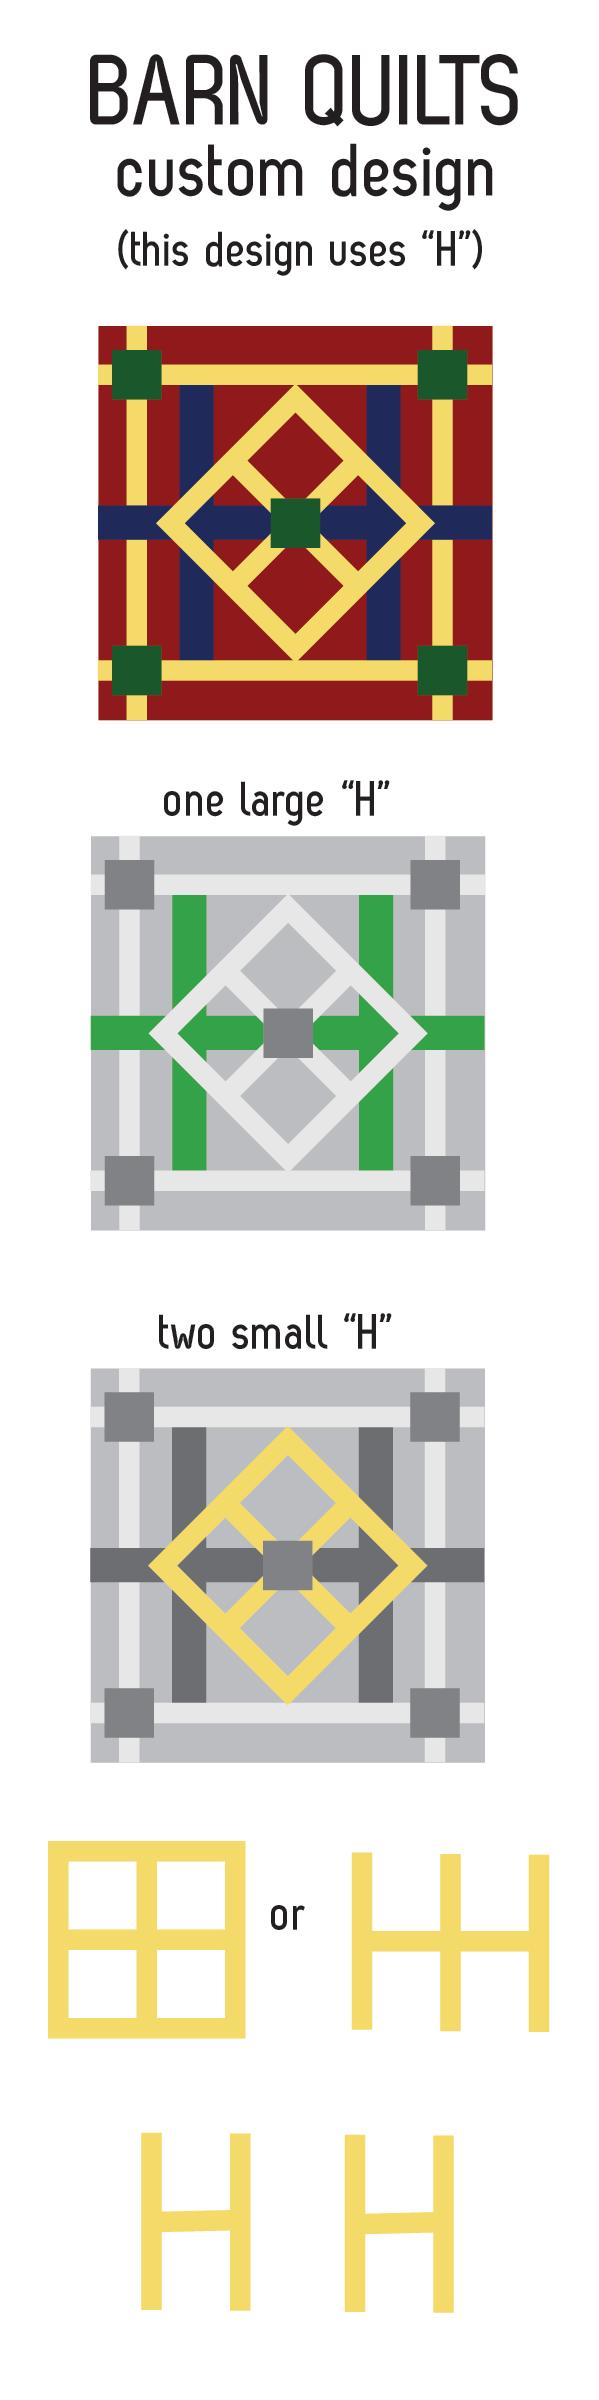 custom barn quilt design